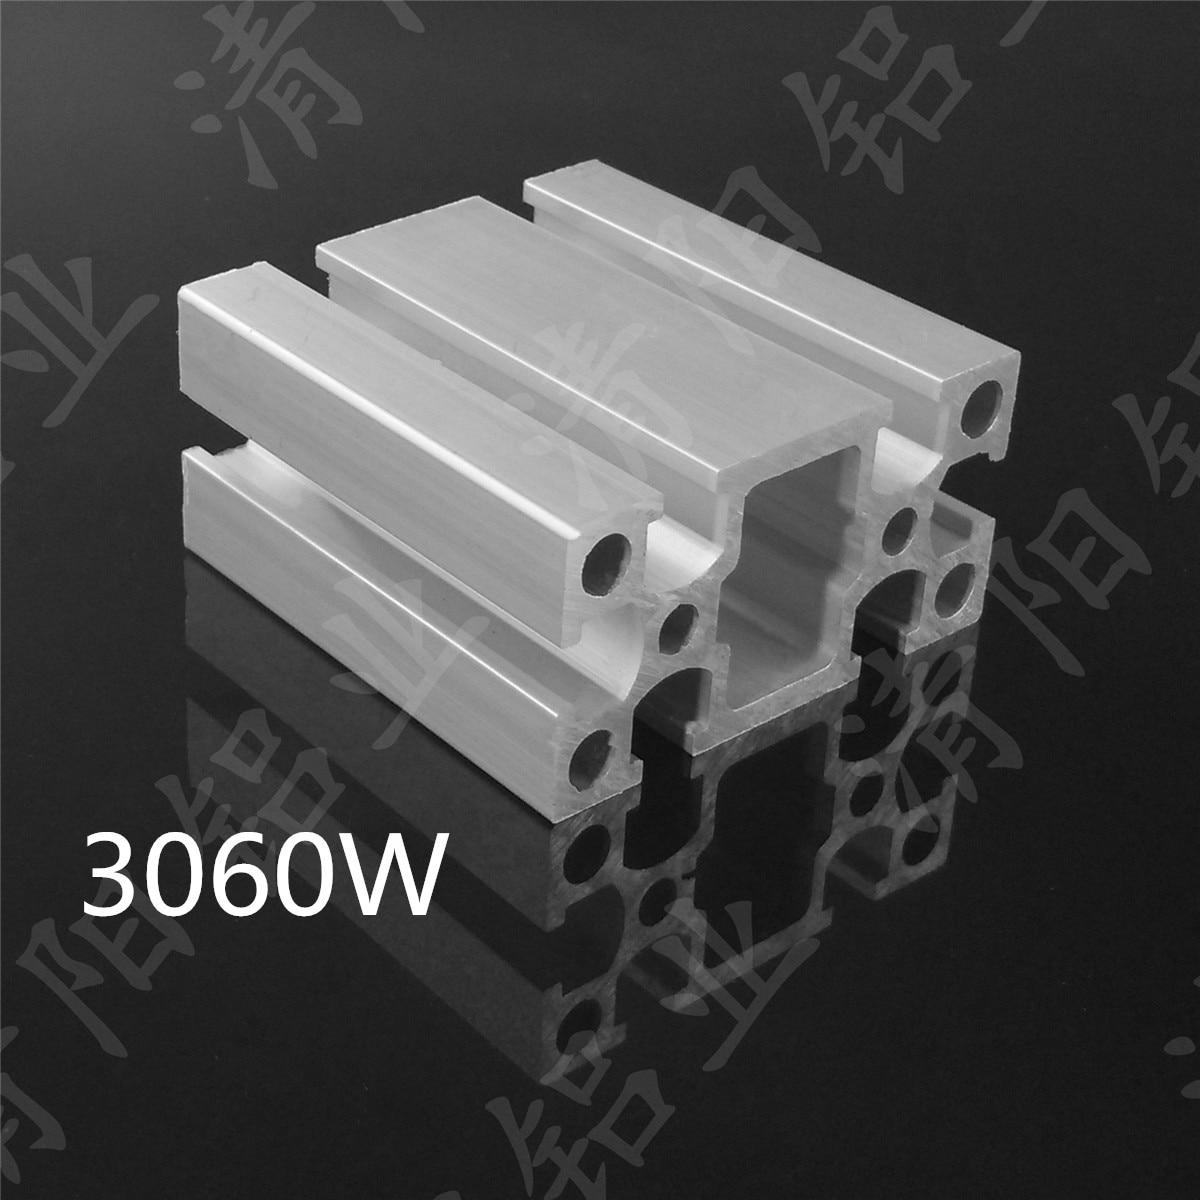 3D Industrial Aluminum Alloy Profile 3060W Heavy Aluminum 3060W Frame Aluminum Workbench Aluminum 3060